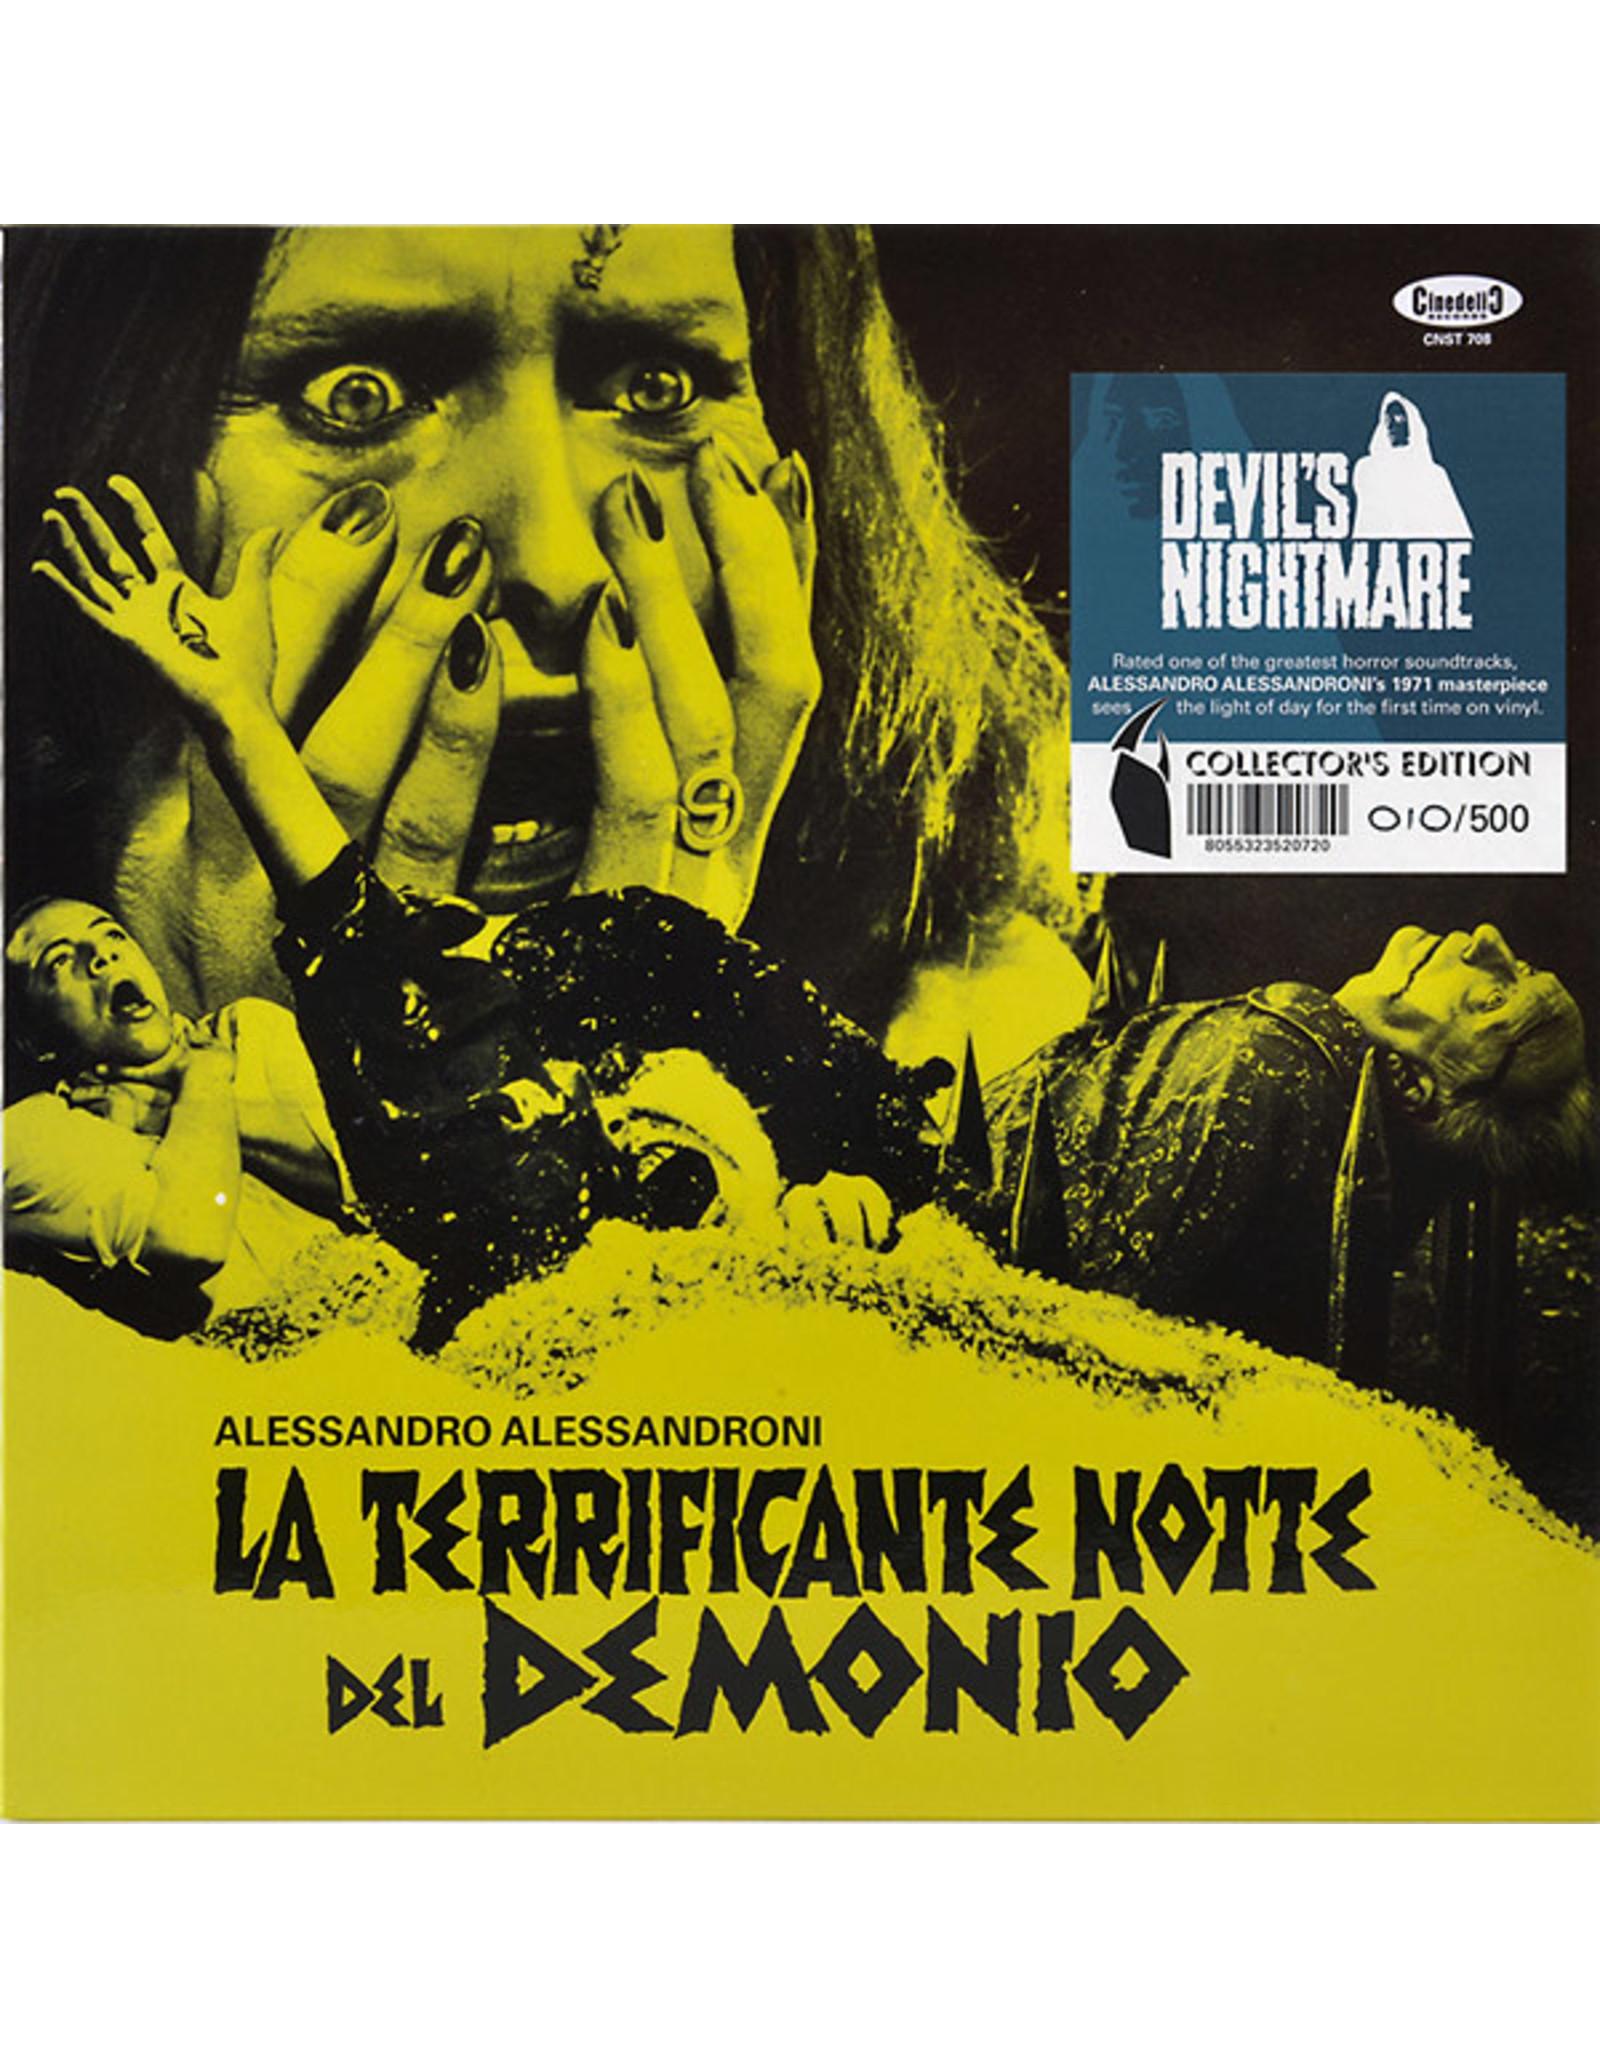 Cinedelic Alessandroni, Alessandro: La Terrificante Notte del Demonio LP LP